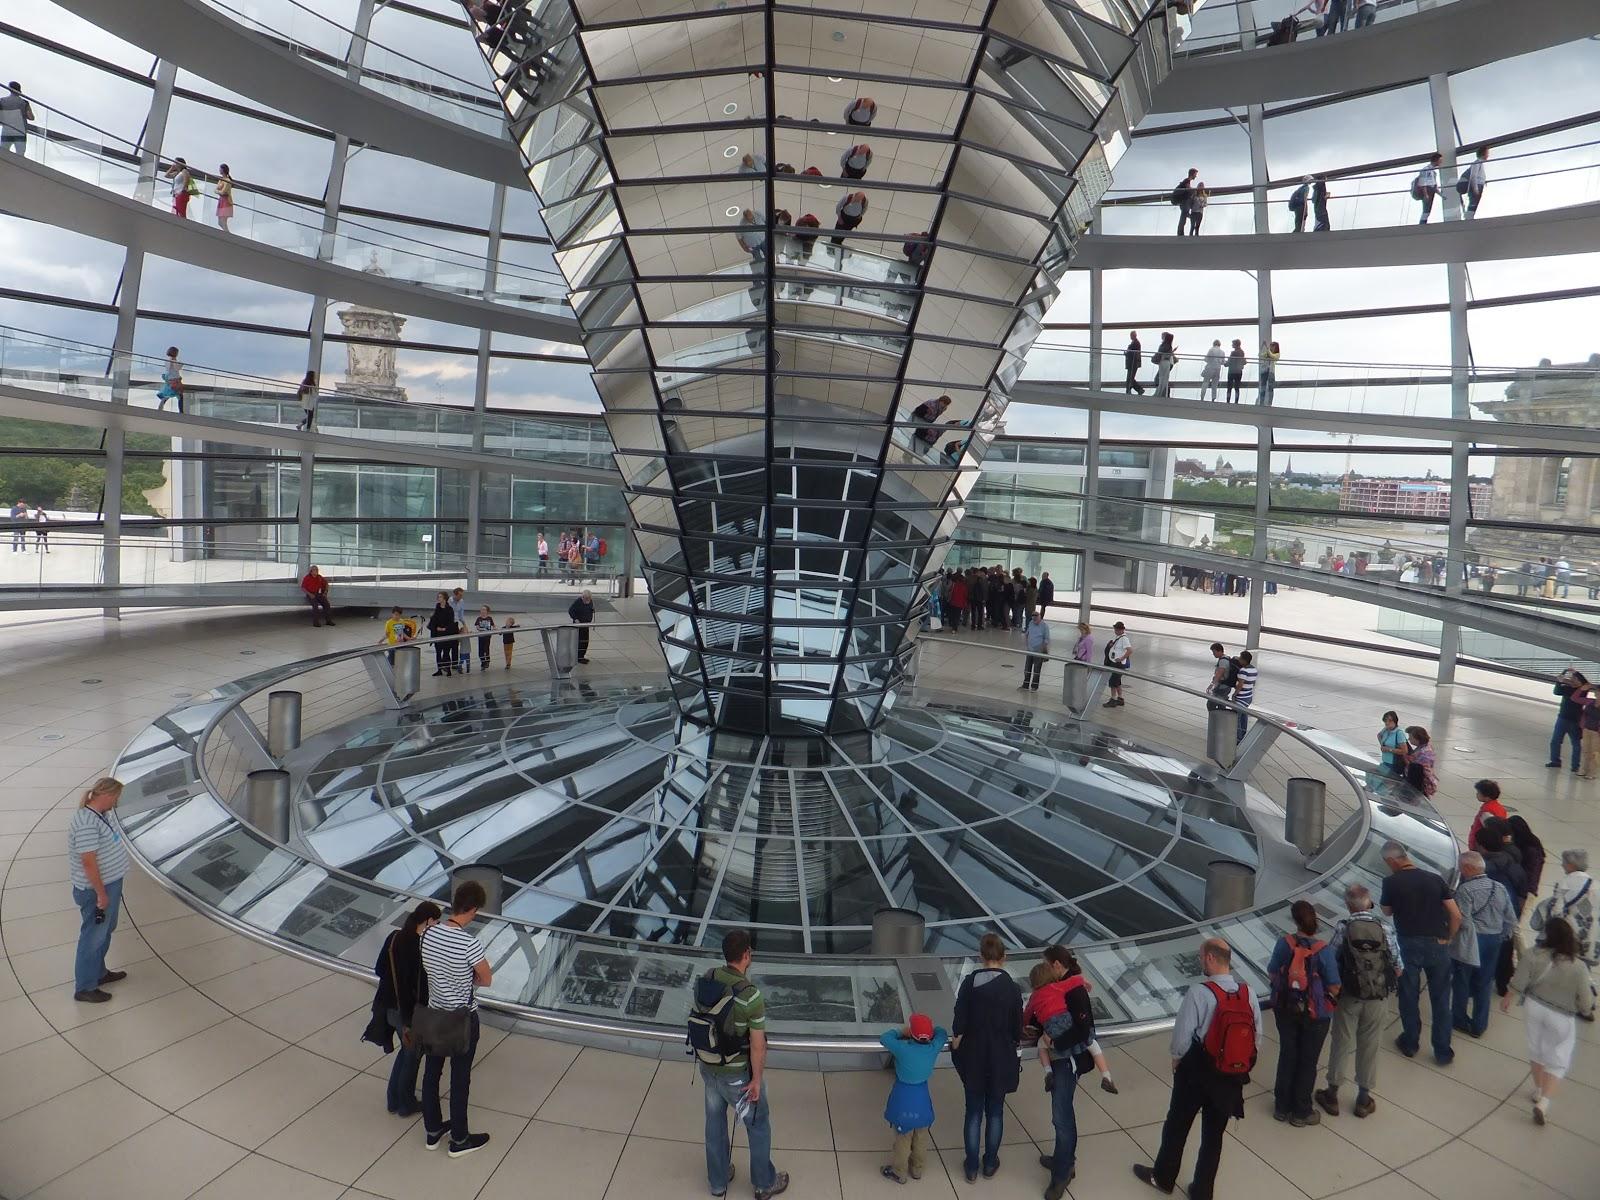 Mitte,Bundestag, Berlín, Elisa N, Blog de Viajes, Lifestyle, Travel